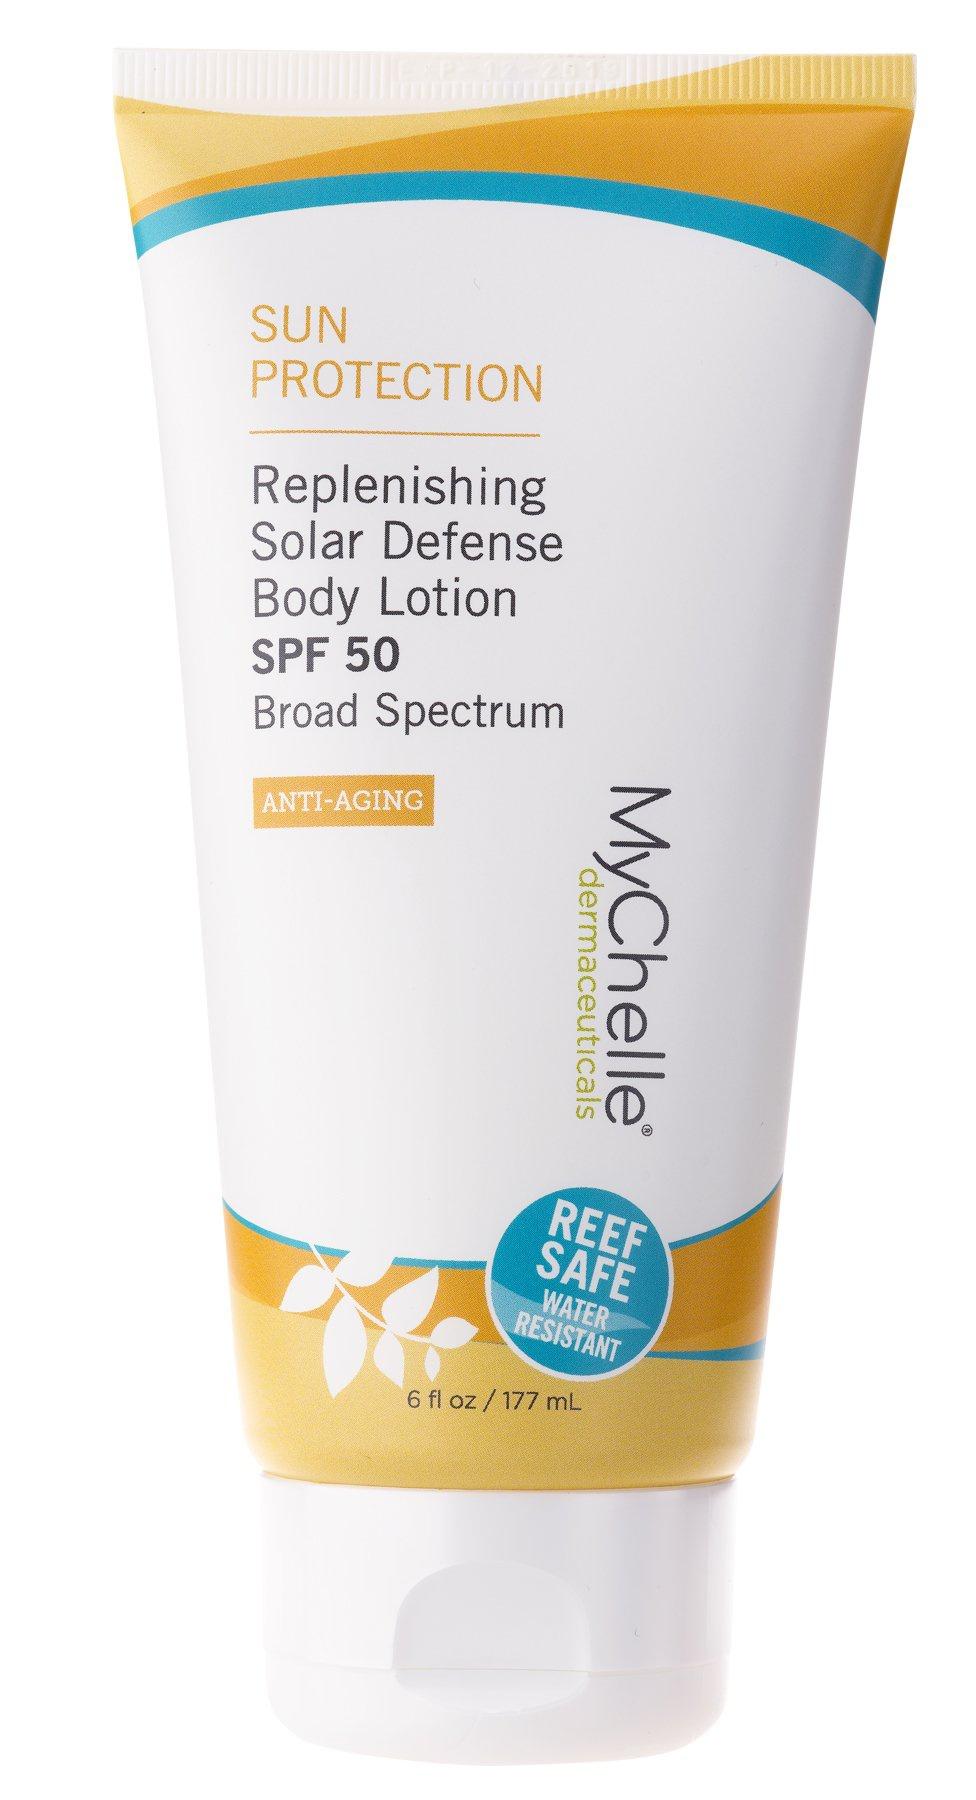 MyChelle Dermaceuticals Sun Protection - Replenishing Solar Defense Body Lotion Spf 50